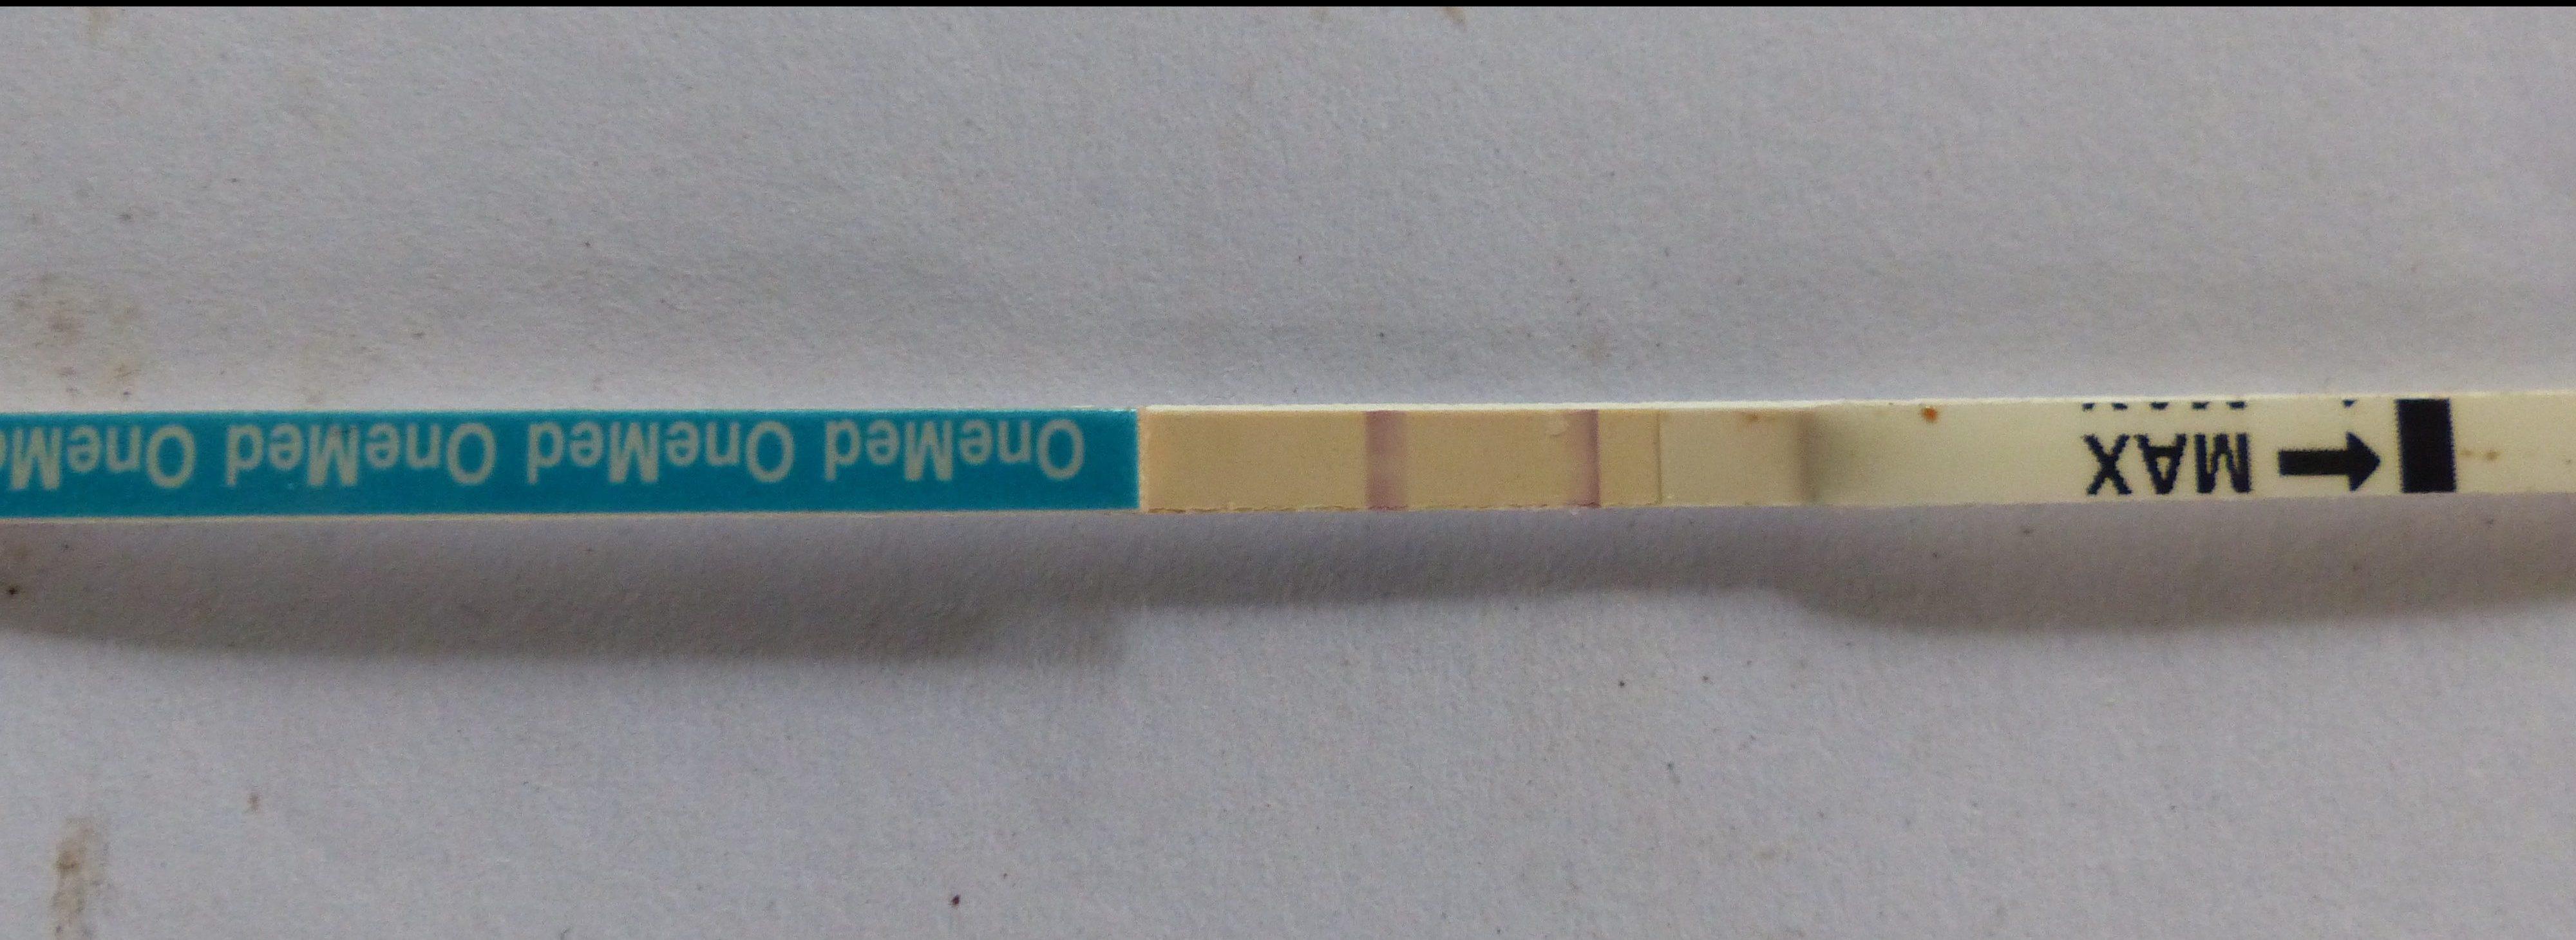 Positive Pregnancy Test Borneo Nature Foundation